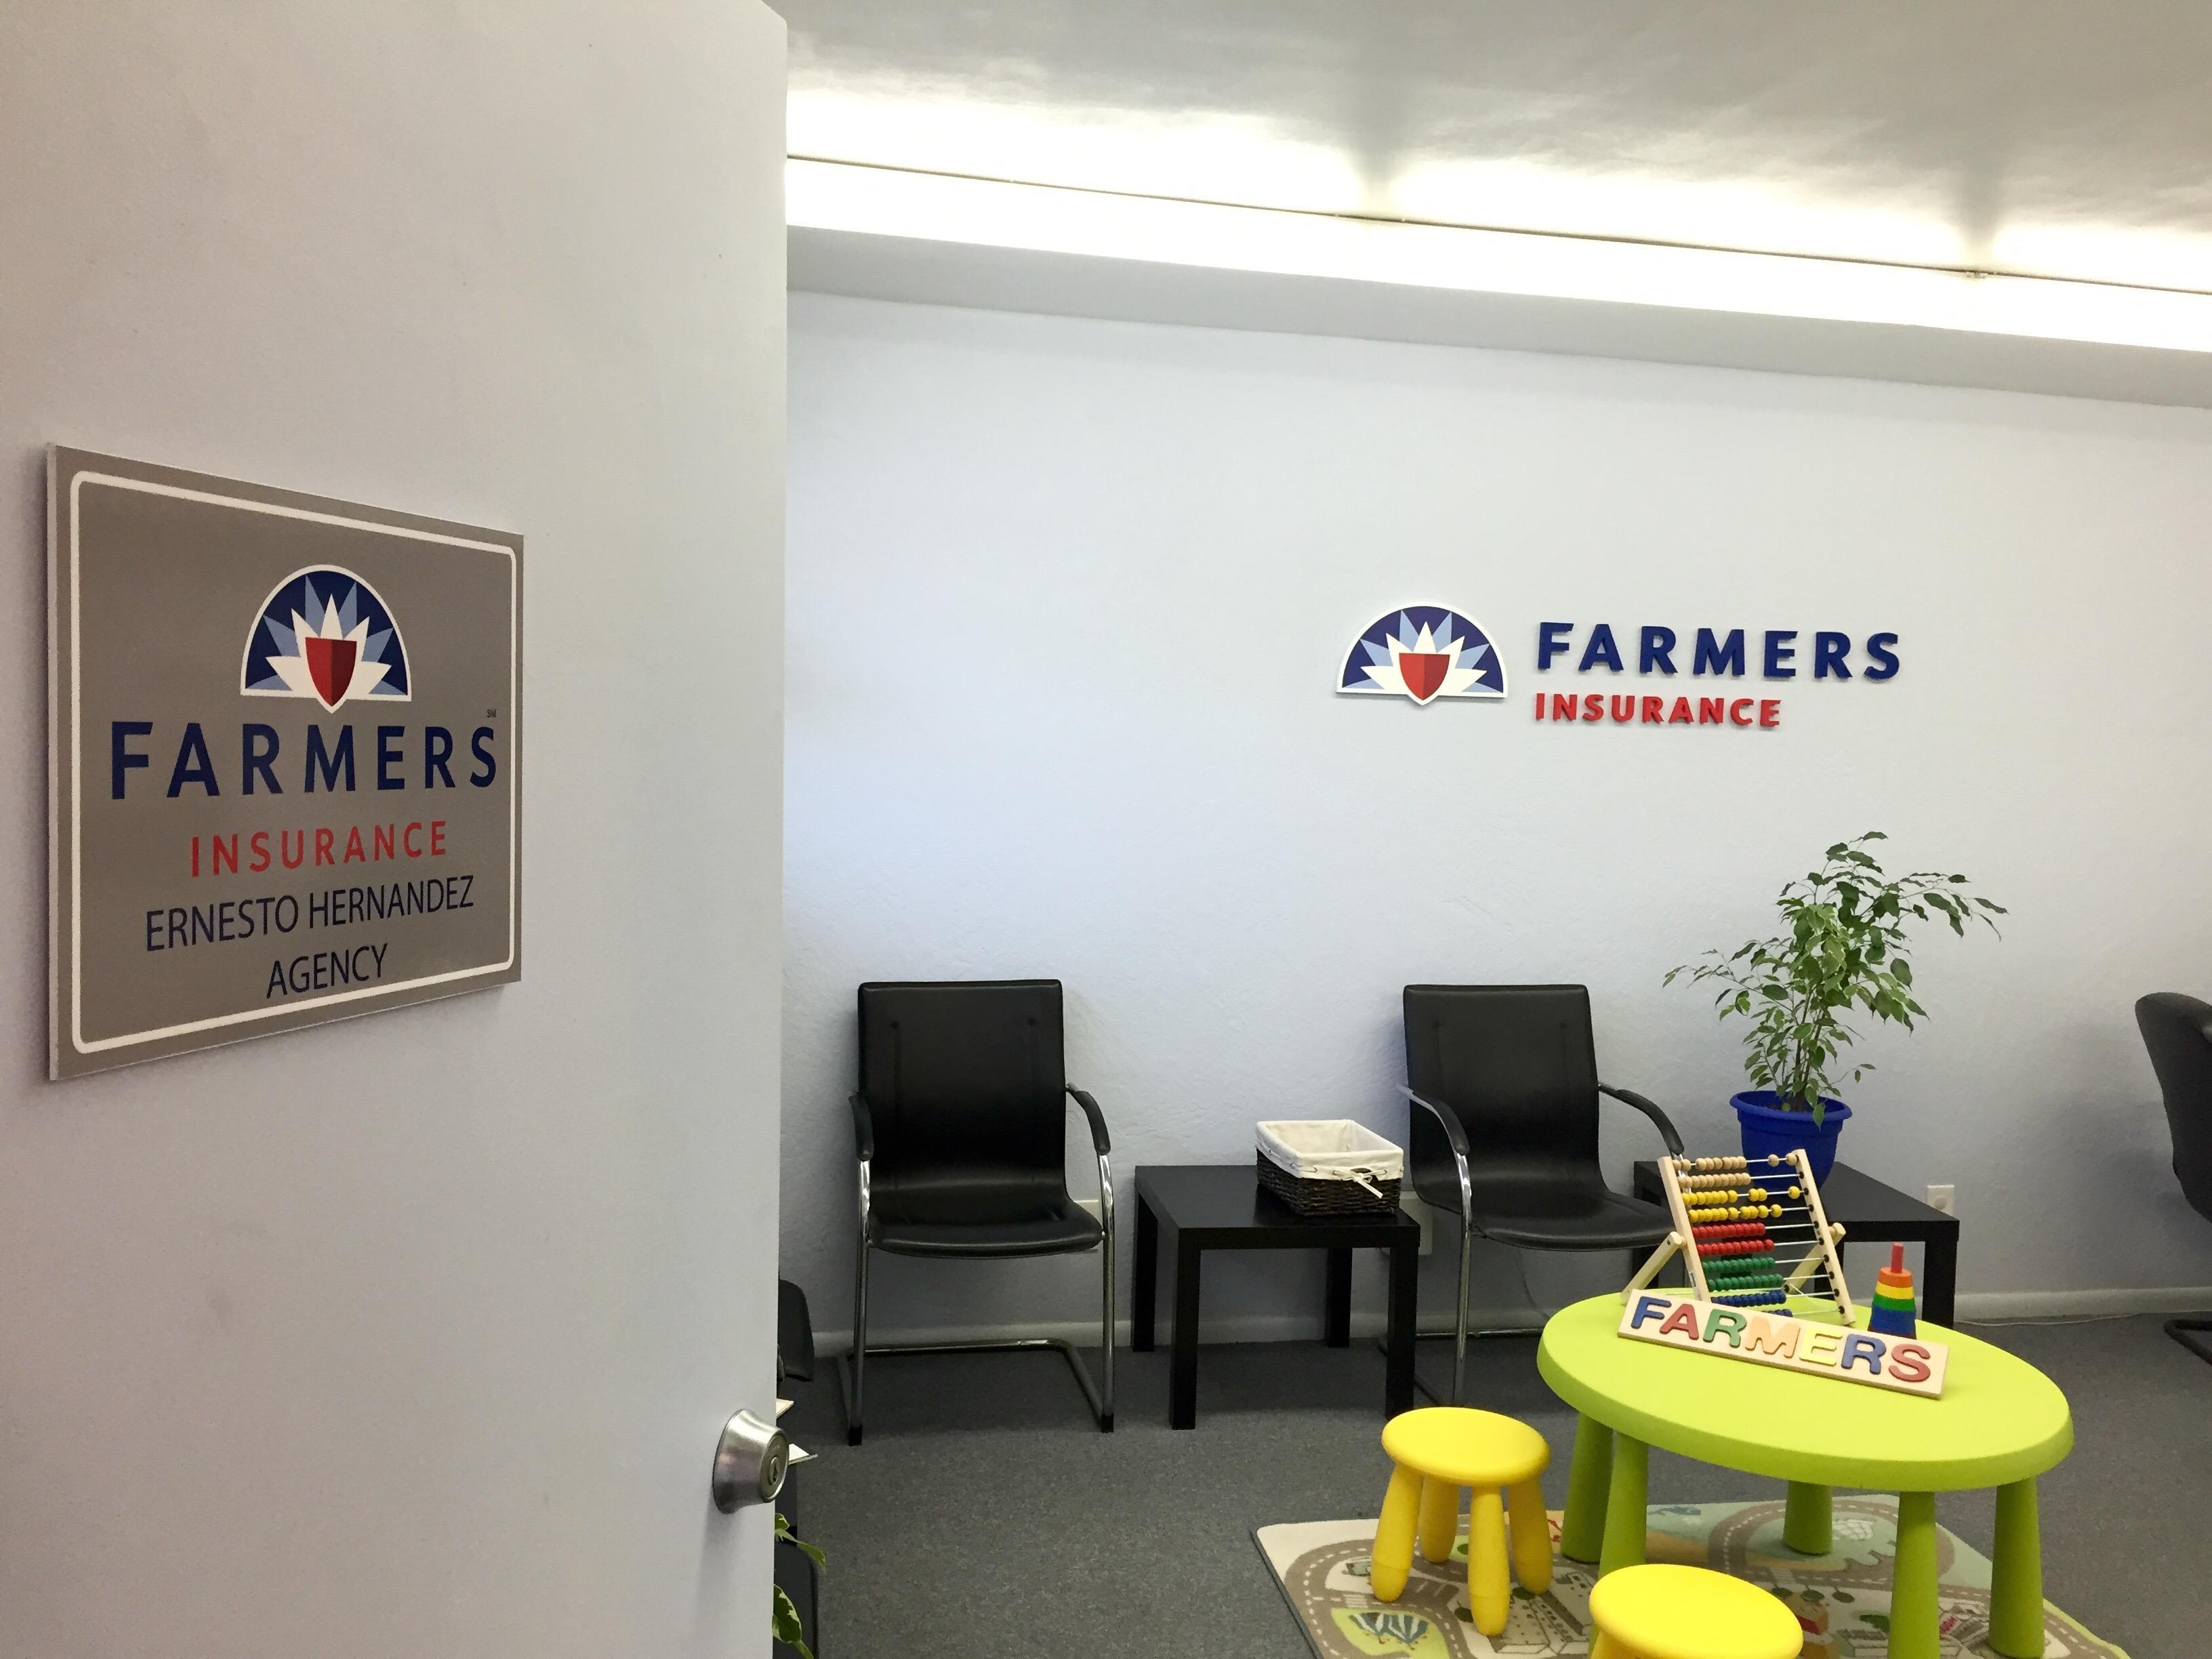 Farmers Insurance - Ernesto Hernandez